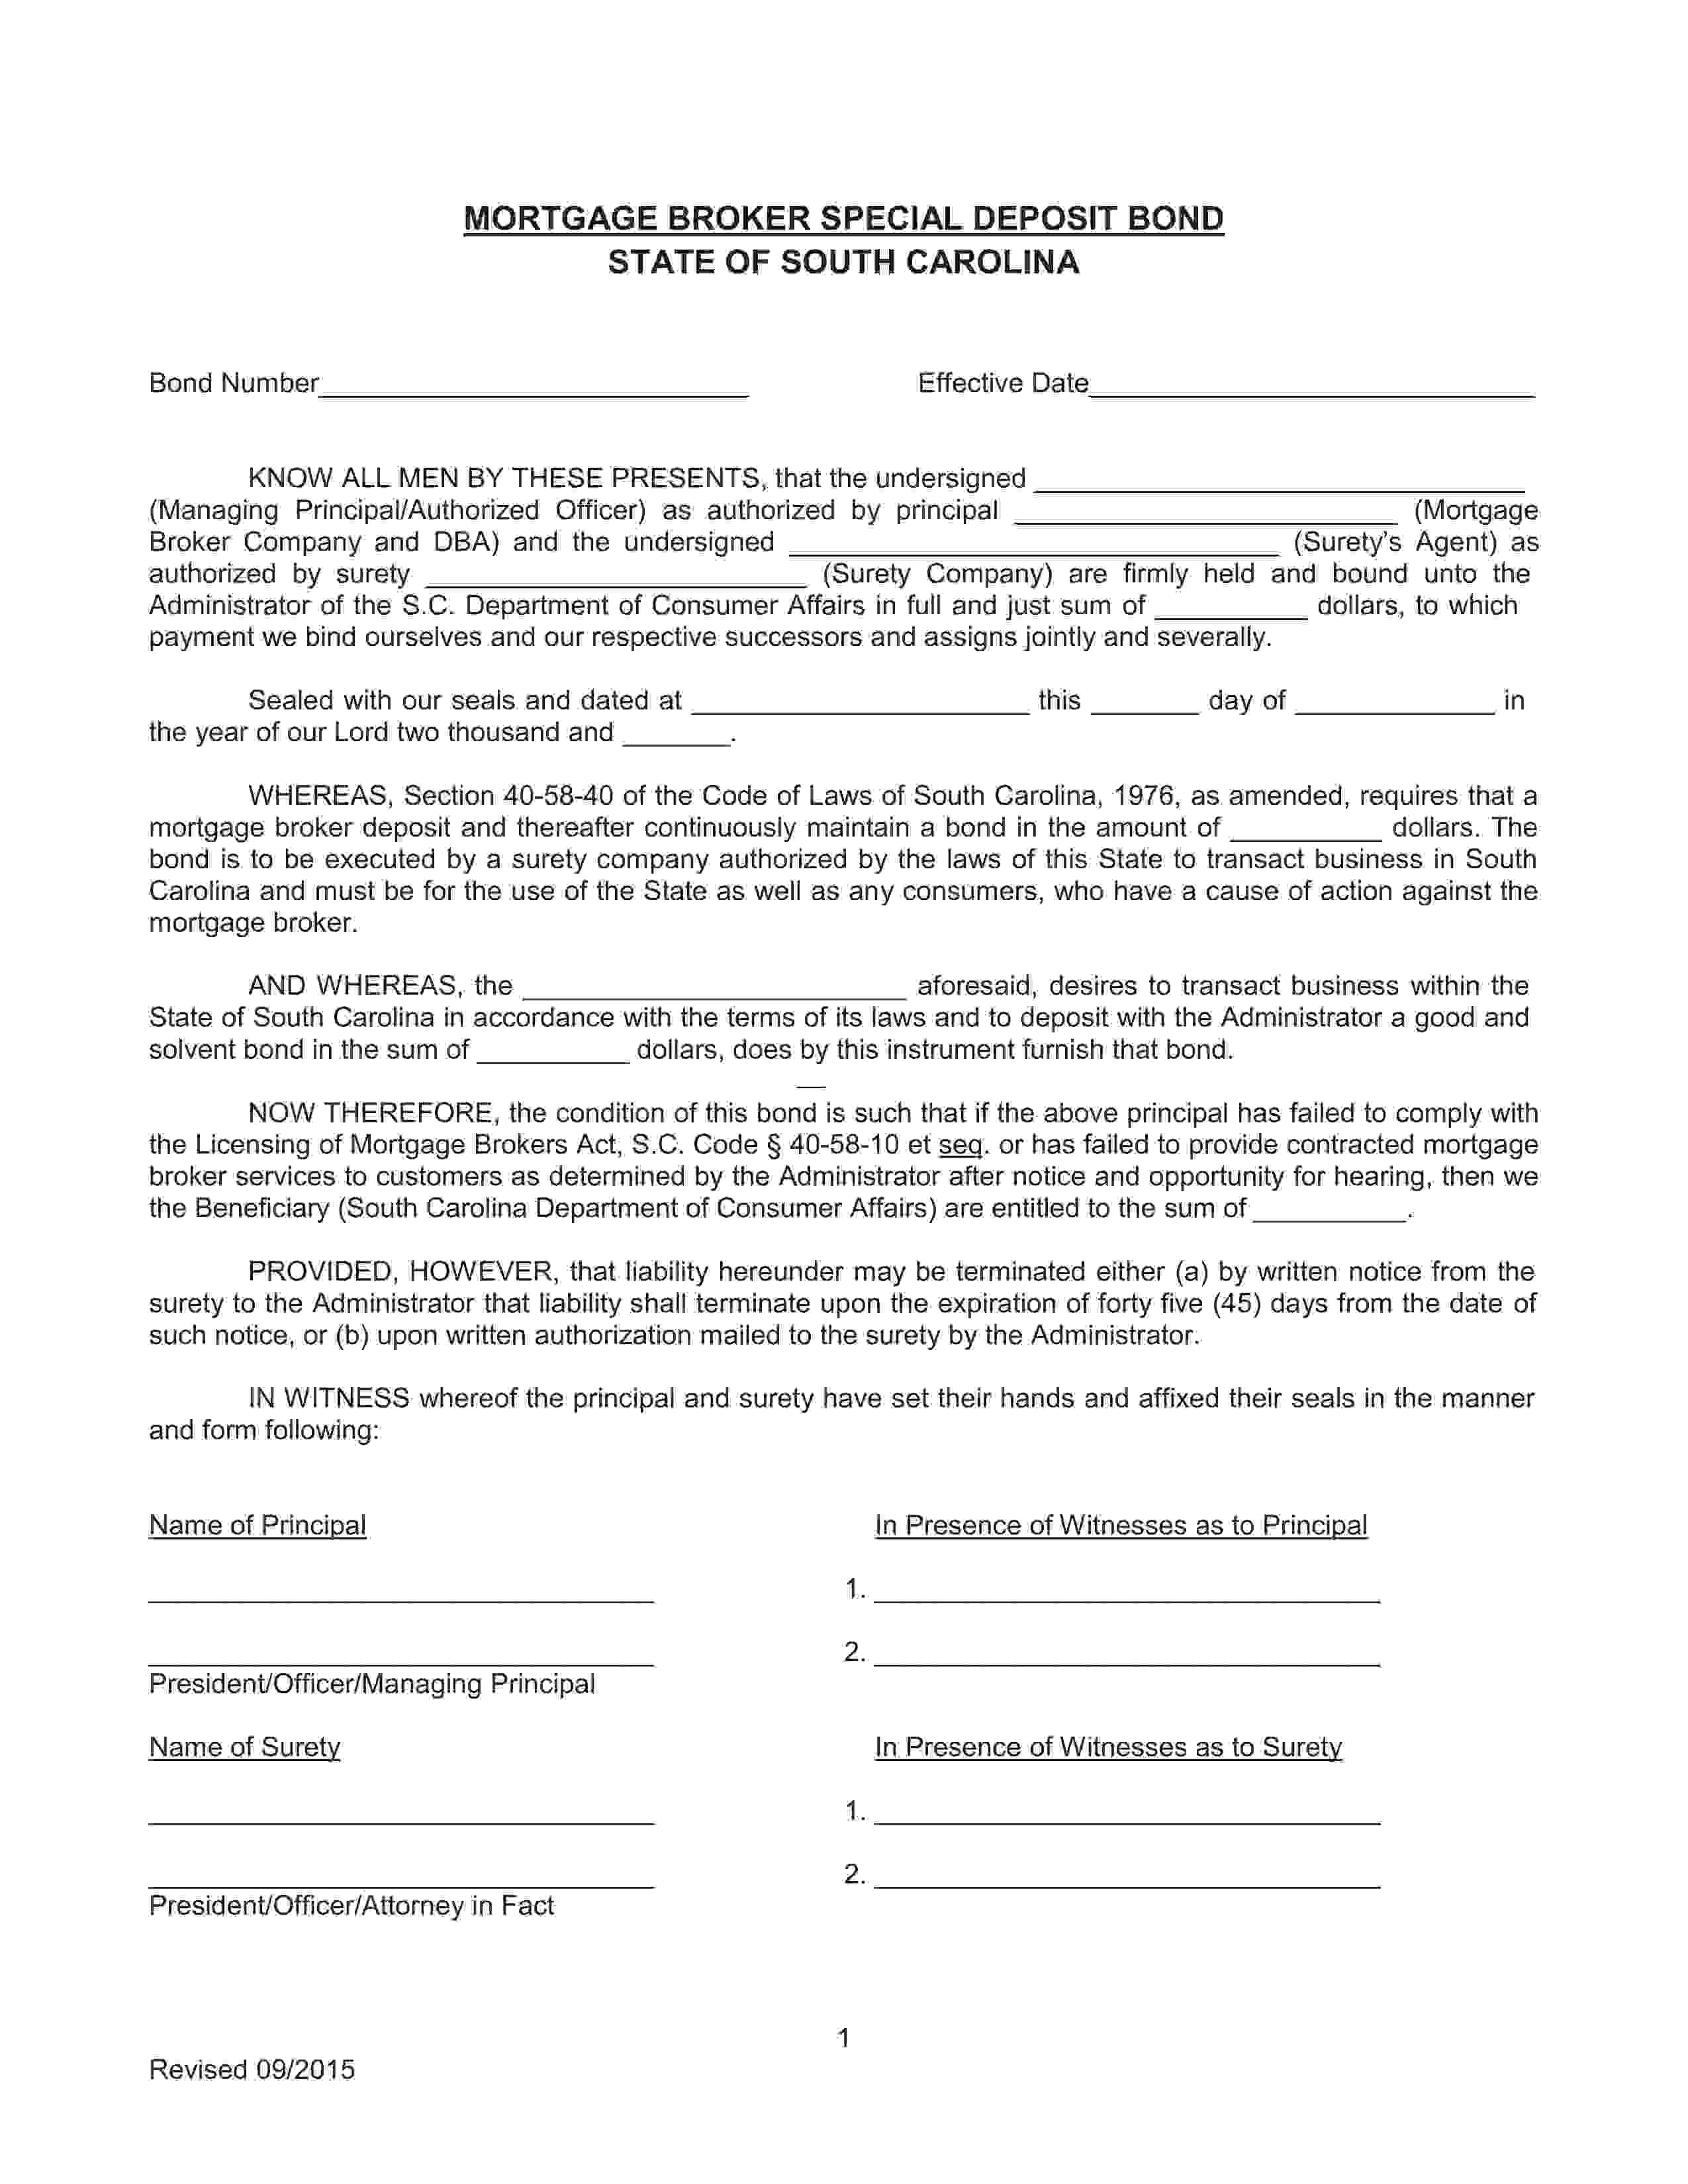 Administrator of the S.C. Department of Consumer Affairs Mortgage Broker Qualified Loan Originator sample image